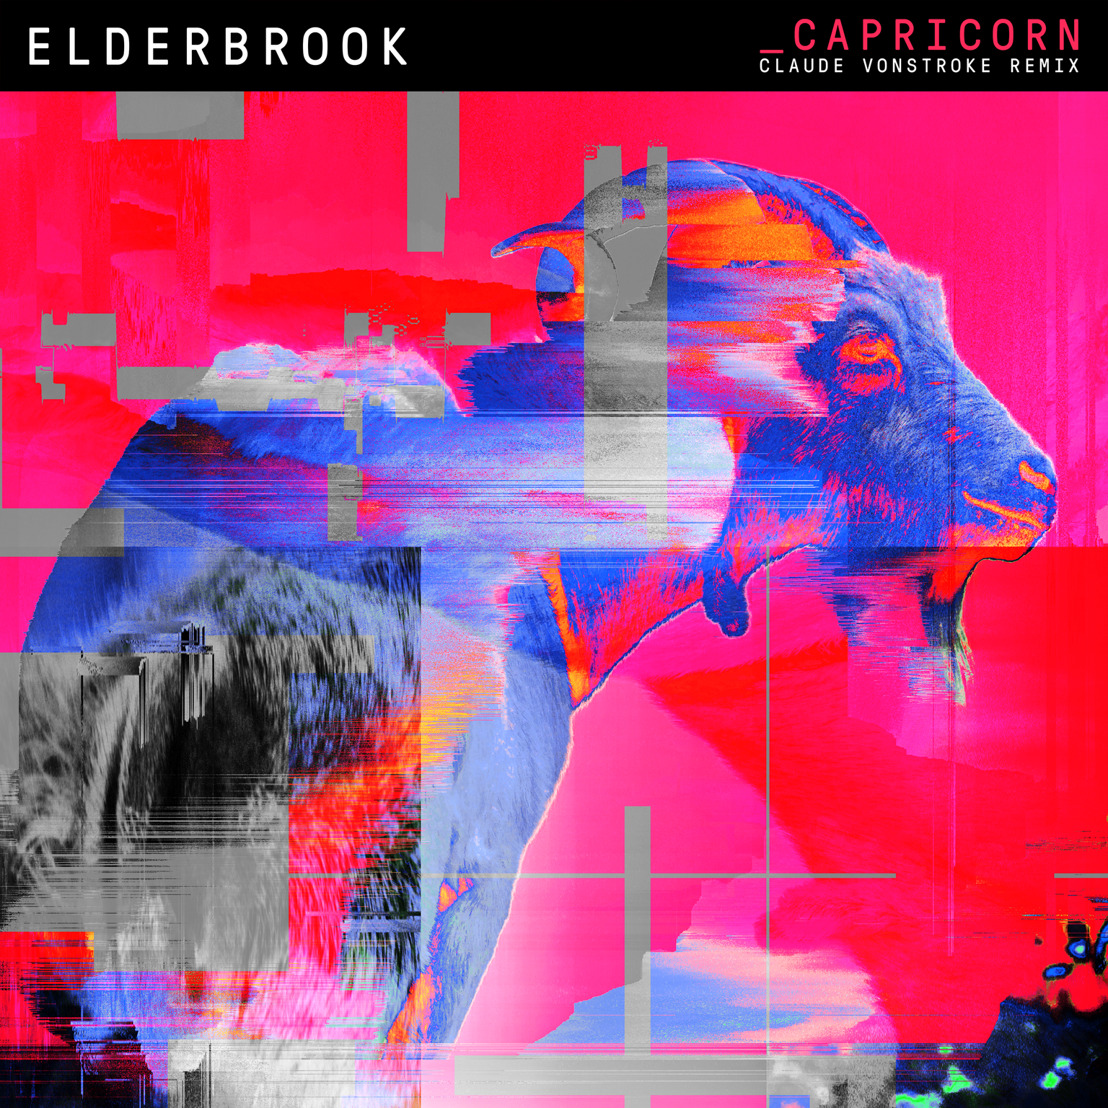 ELDERBROOK SHARES NEW CLAUDE VONSTROKE REMIX OF 'CAPRICORN'